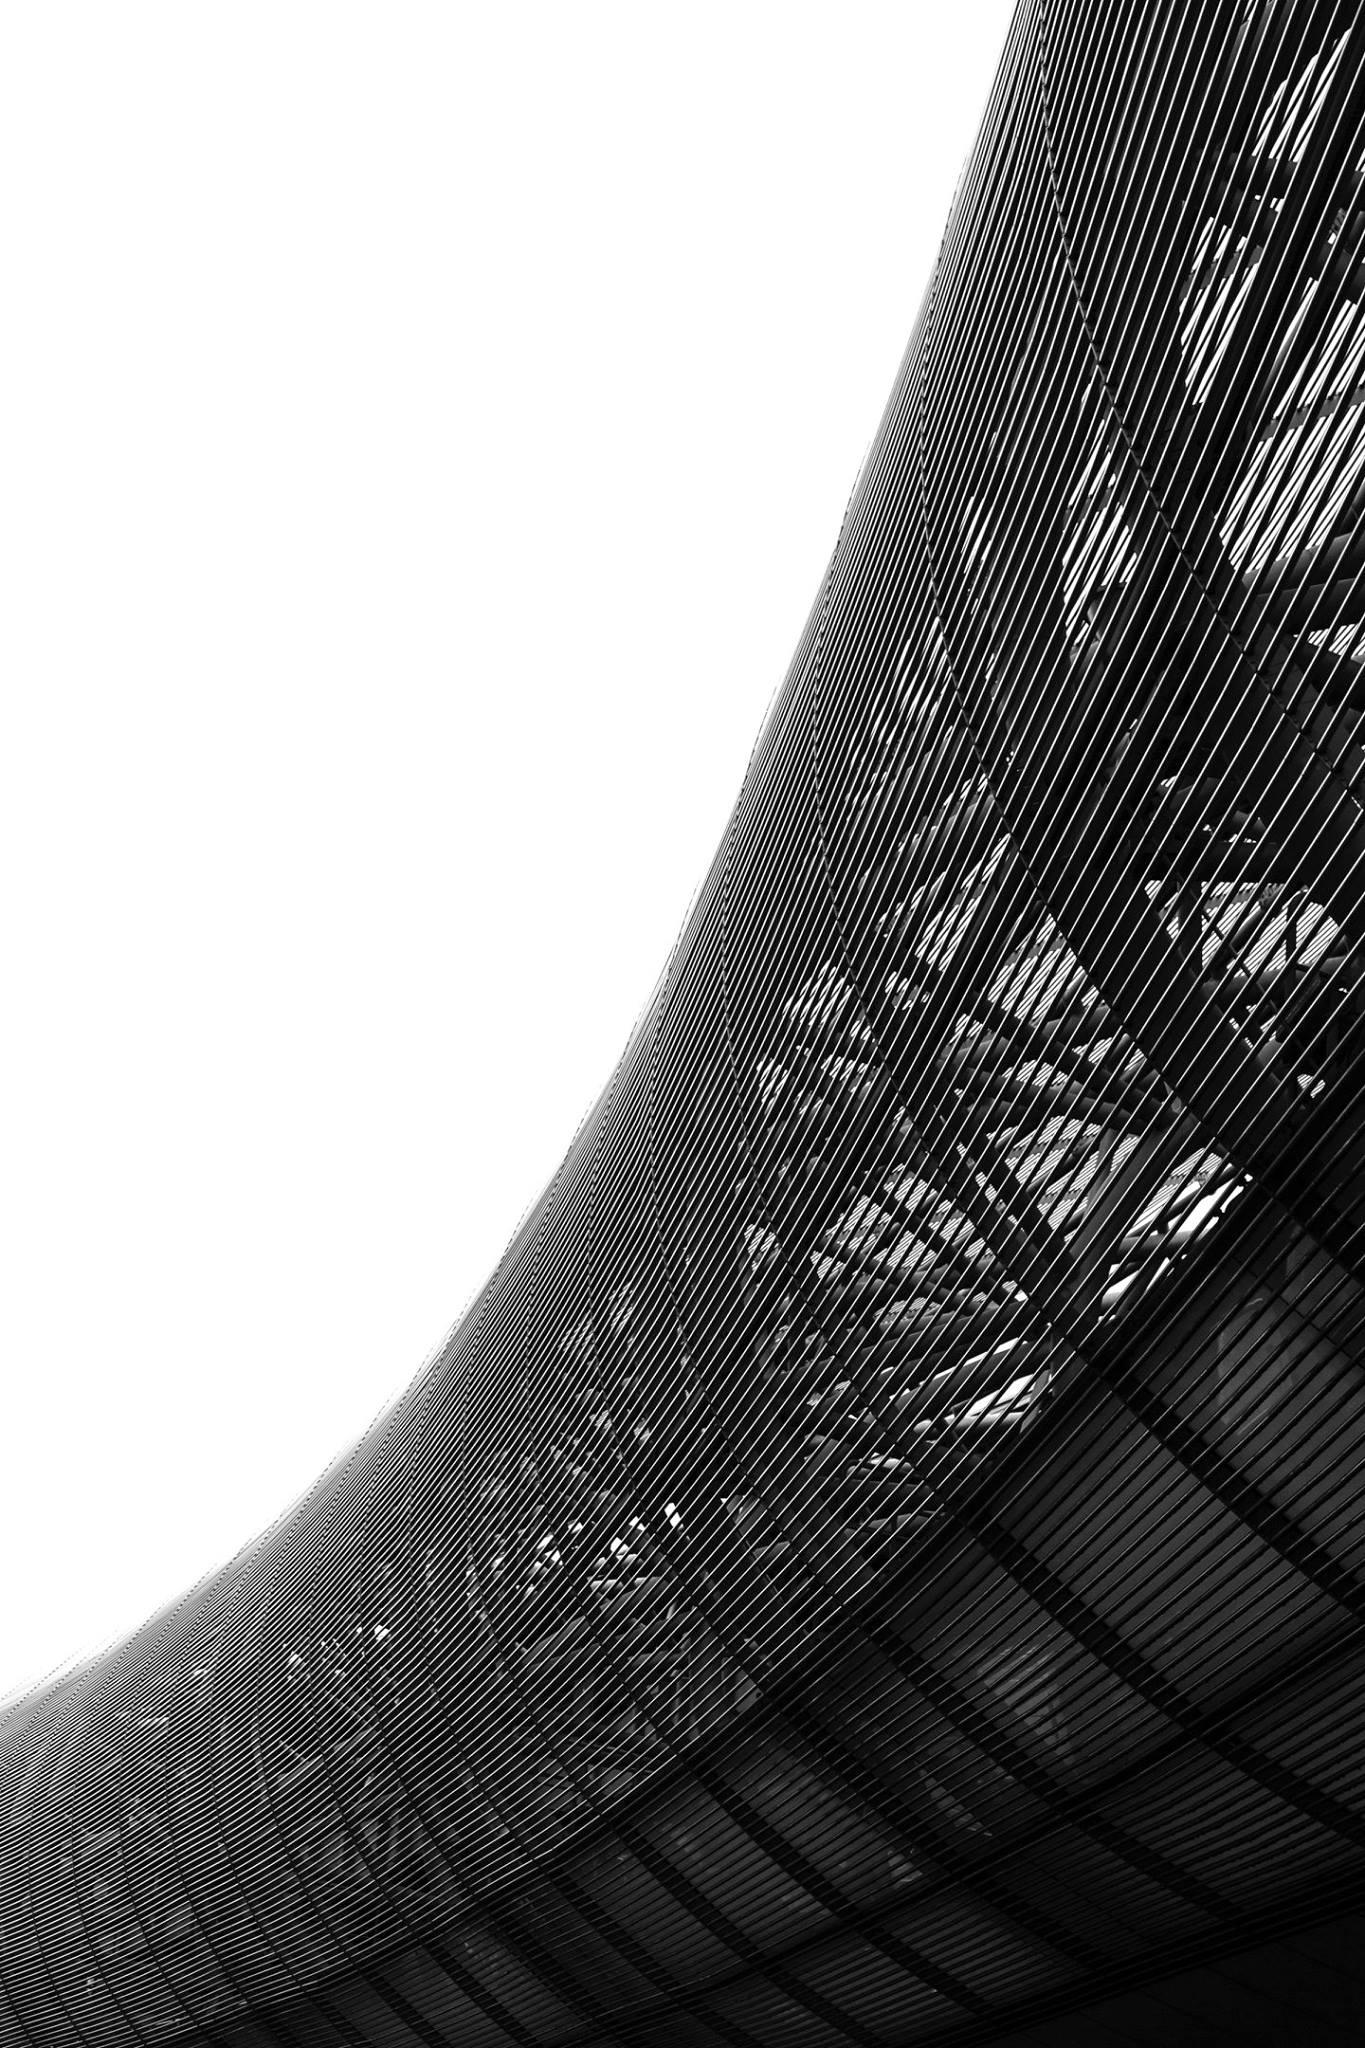 kevin-krautgartner-architecture-photography-09